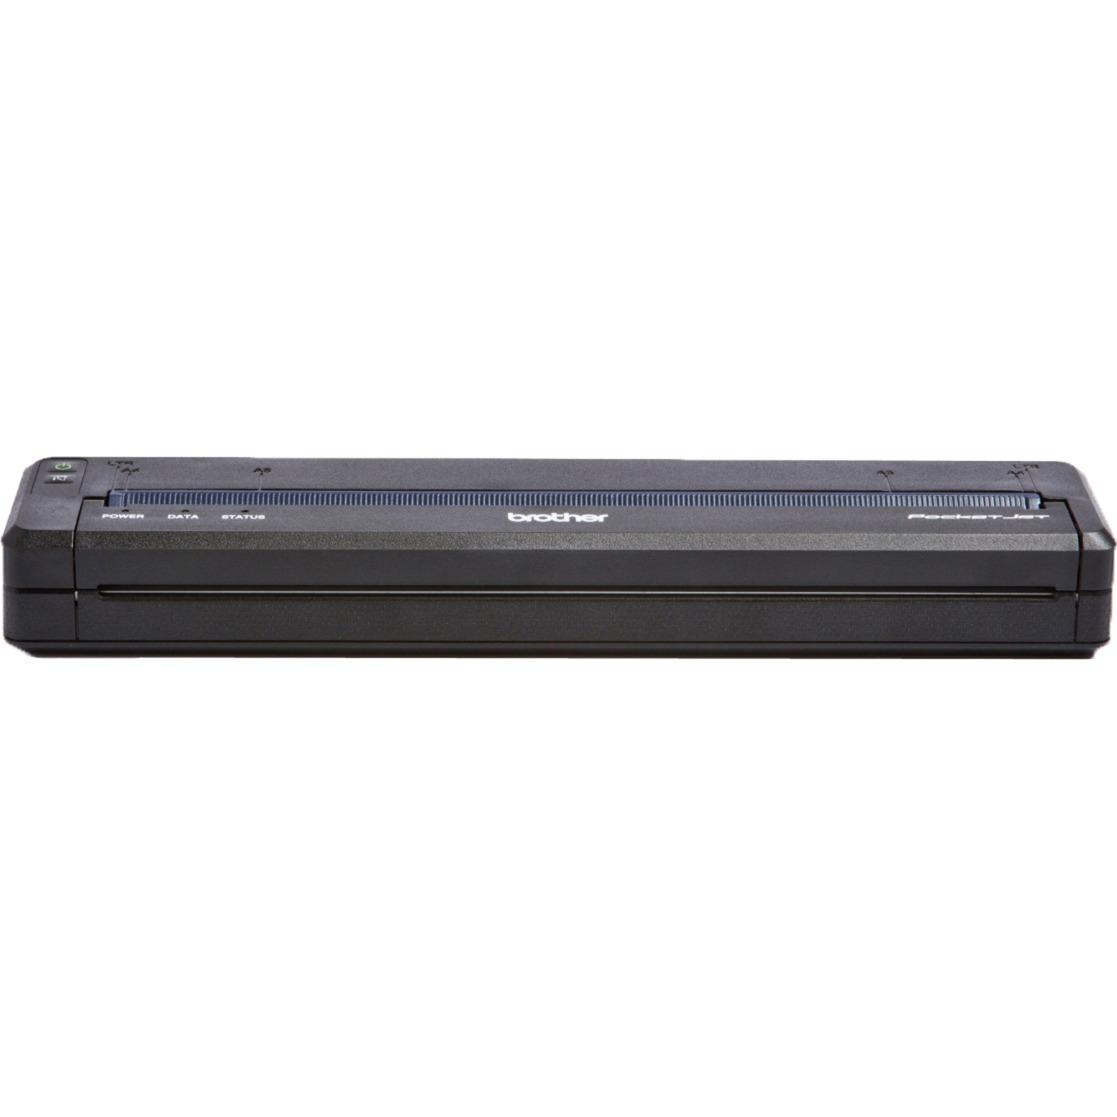 pj-773-termisk-mobil-printer-300-x-300dpi-pos-printer-til-kvittering-termisk-printer